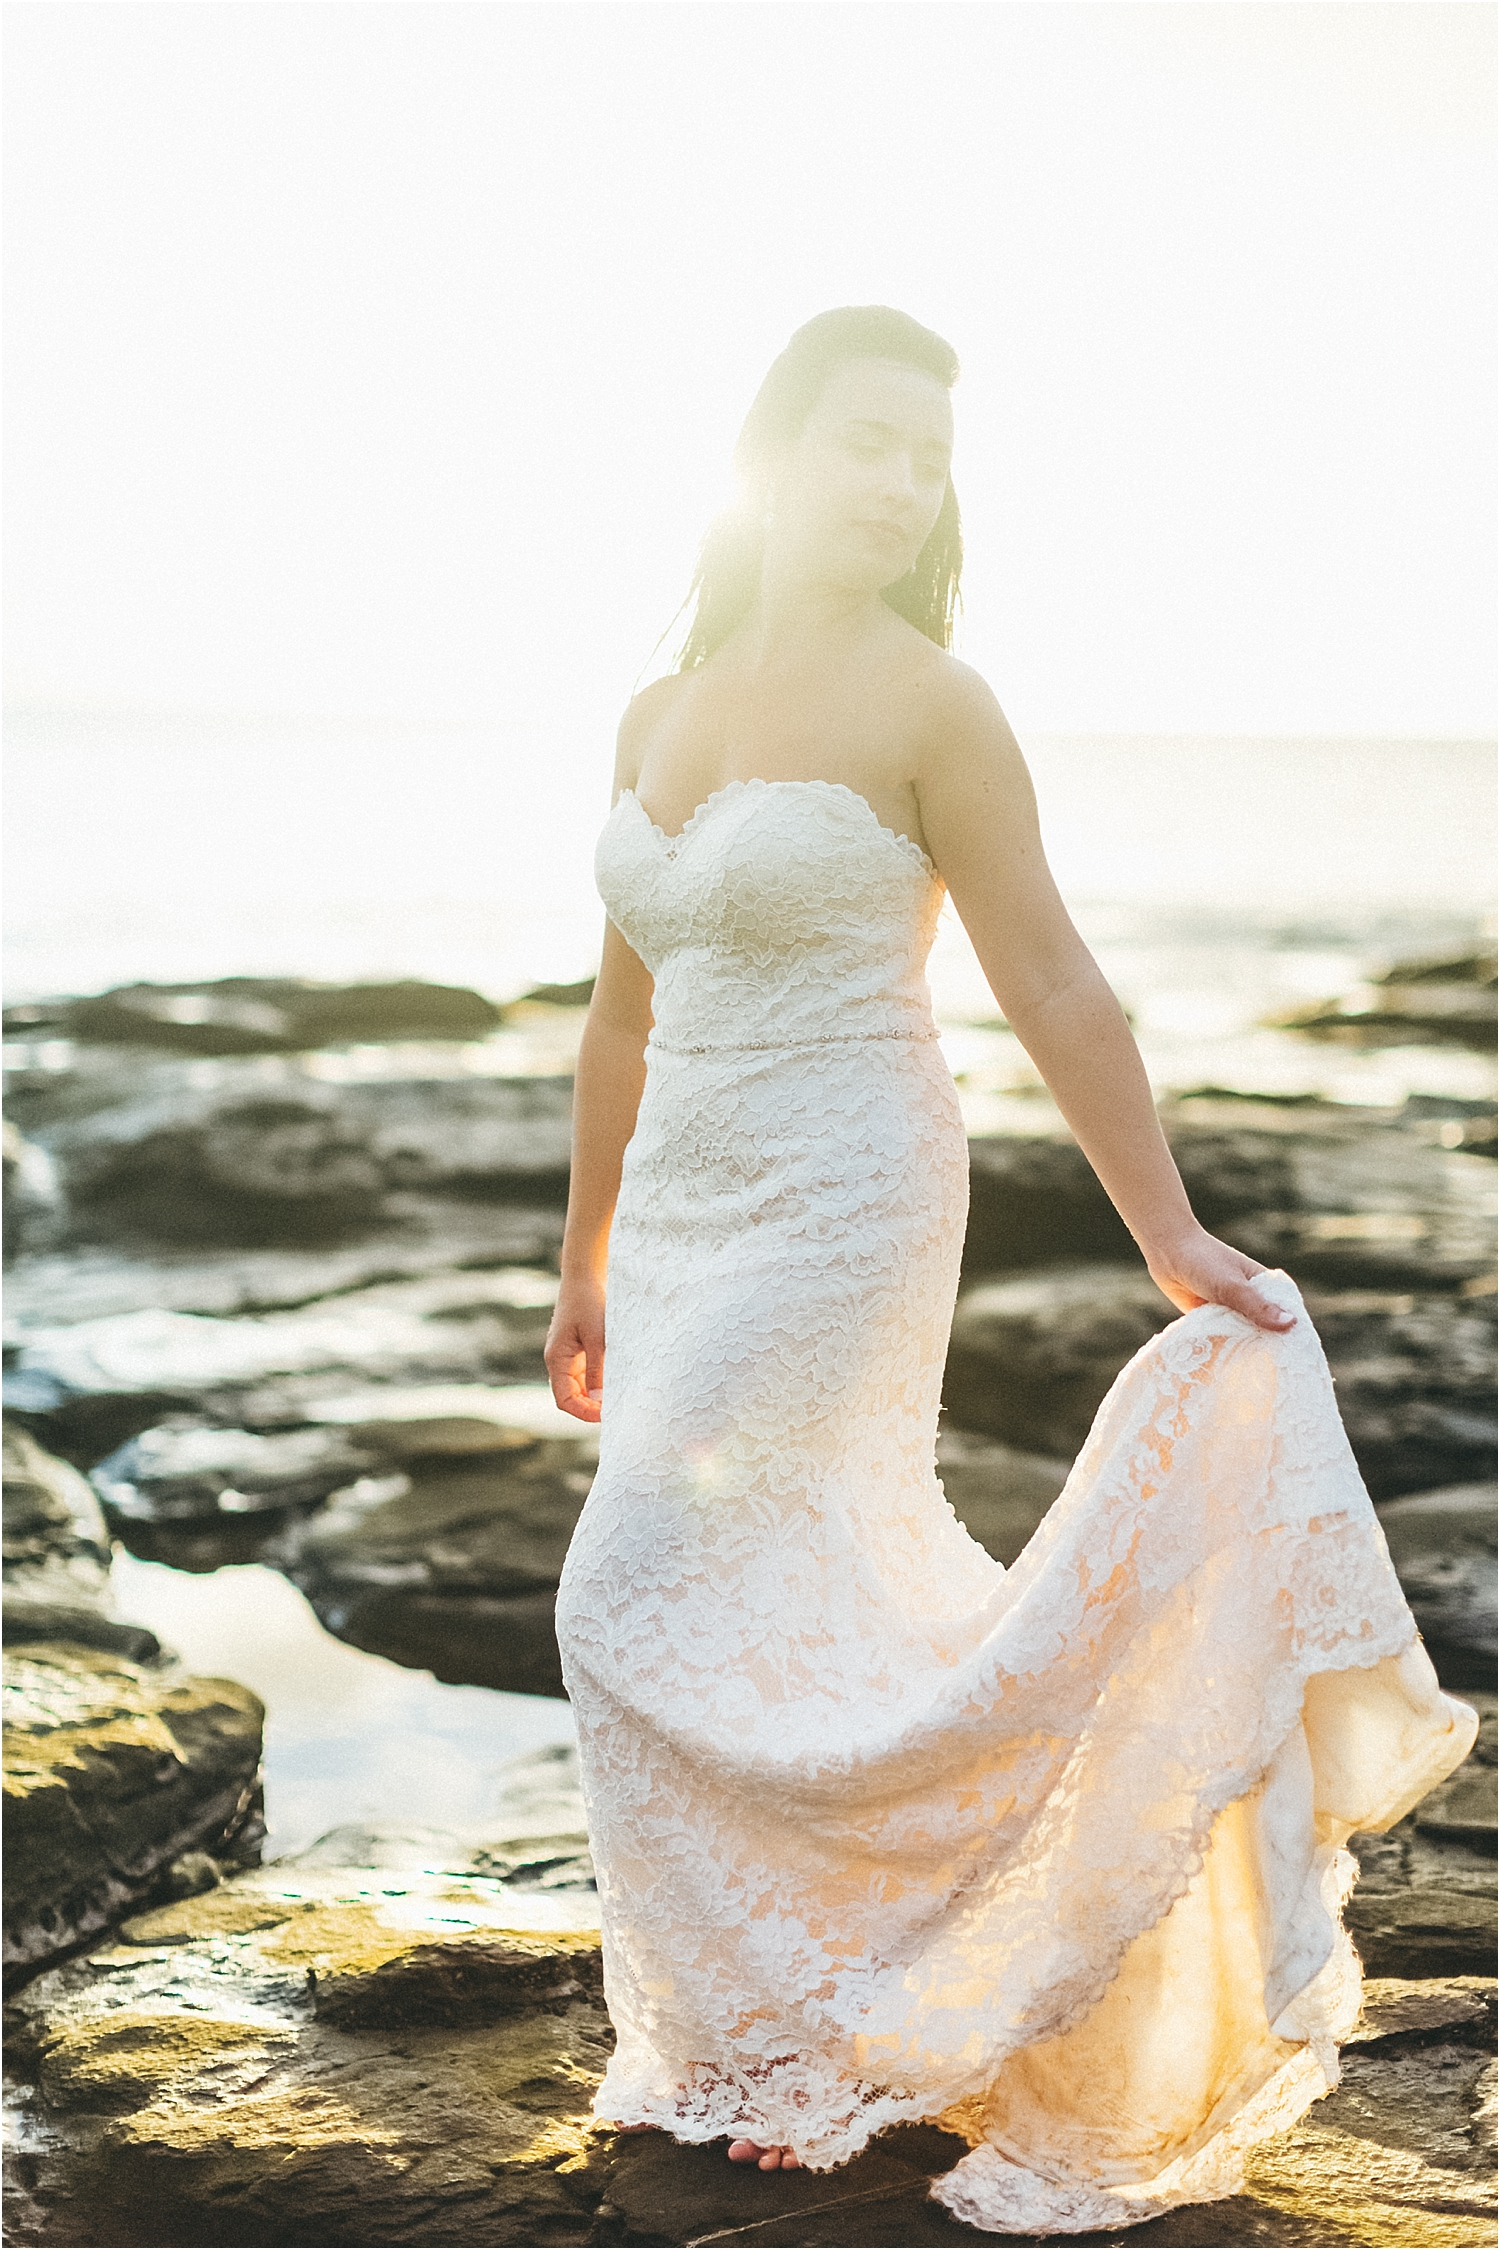 angie-diaz-photography-maui-wedding-ironwoods-beach_0060.jpg